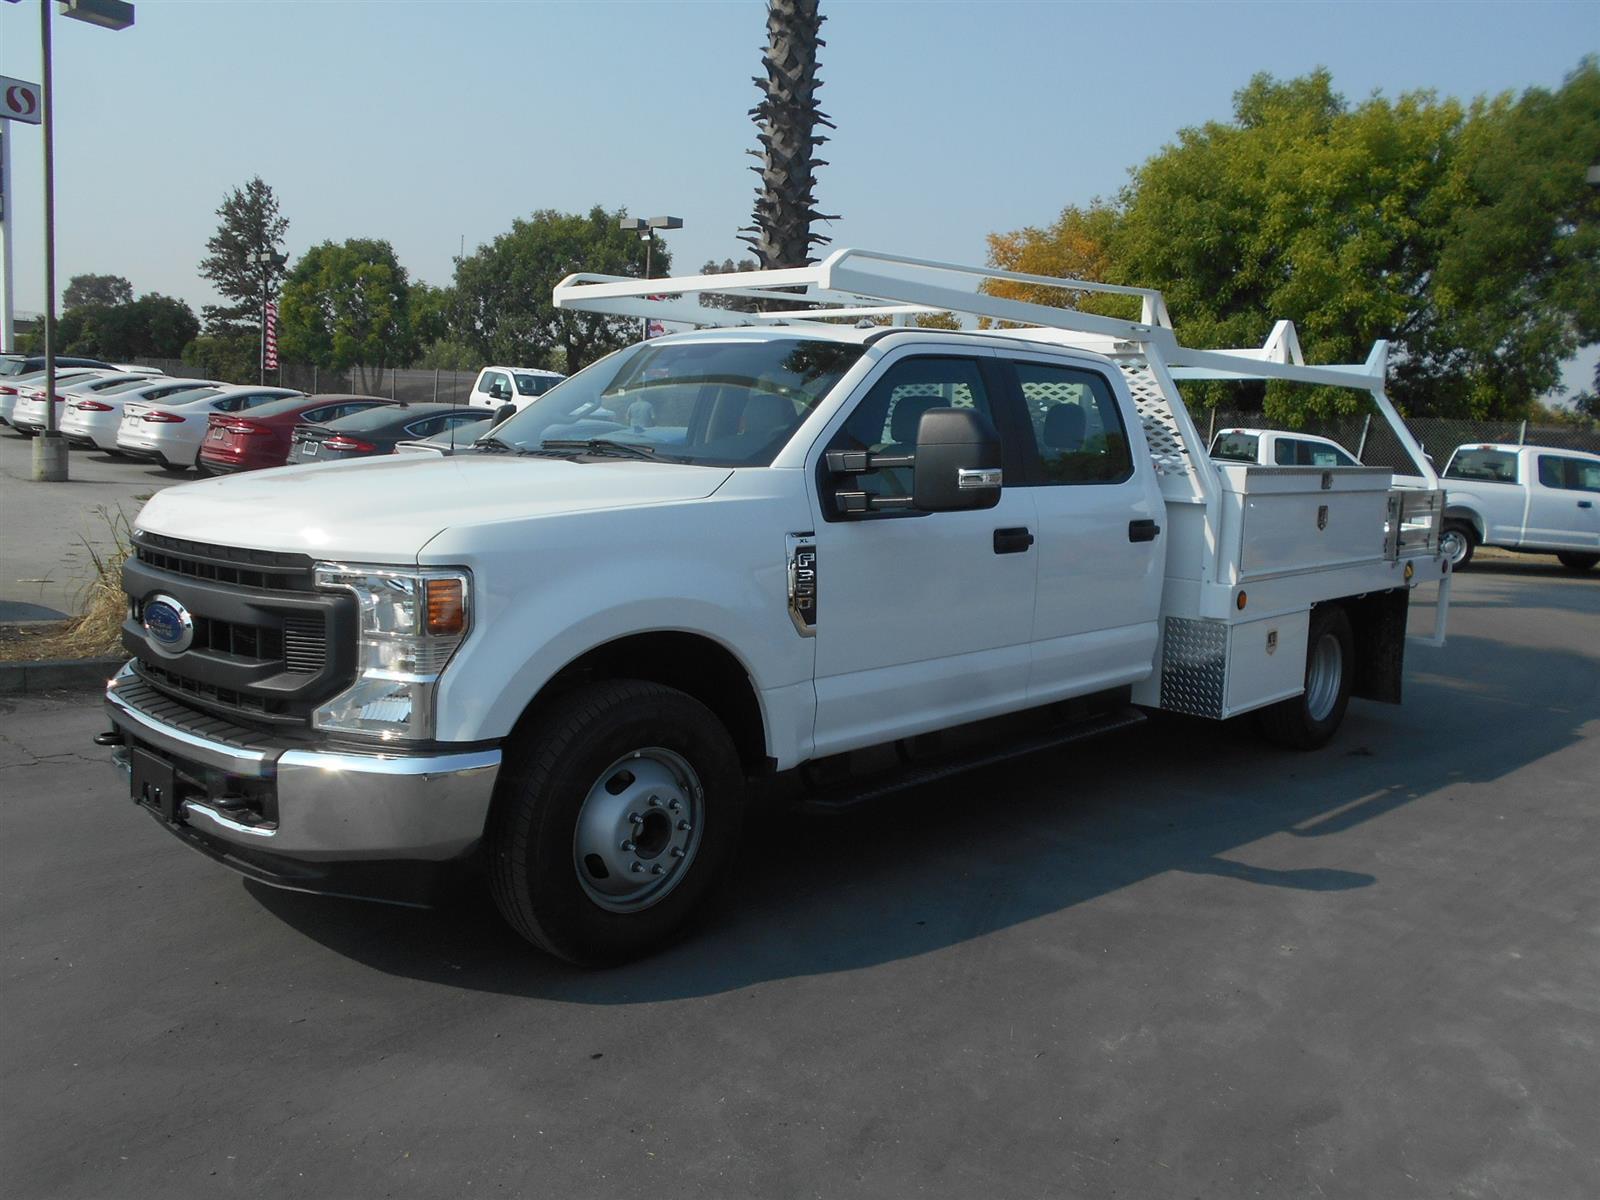 2020 Ford F-350 Crew Cab DRW 4x2, Scelzi Contractor Body #57492 - photo 1